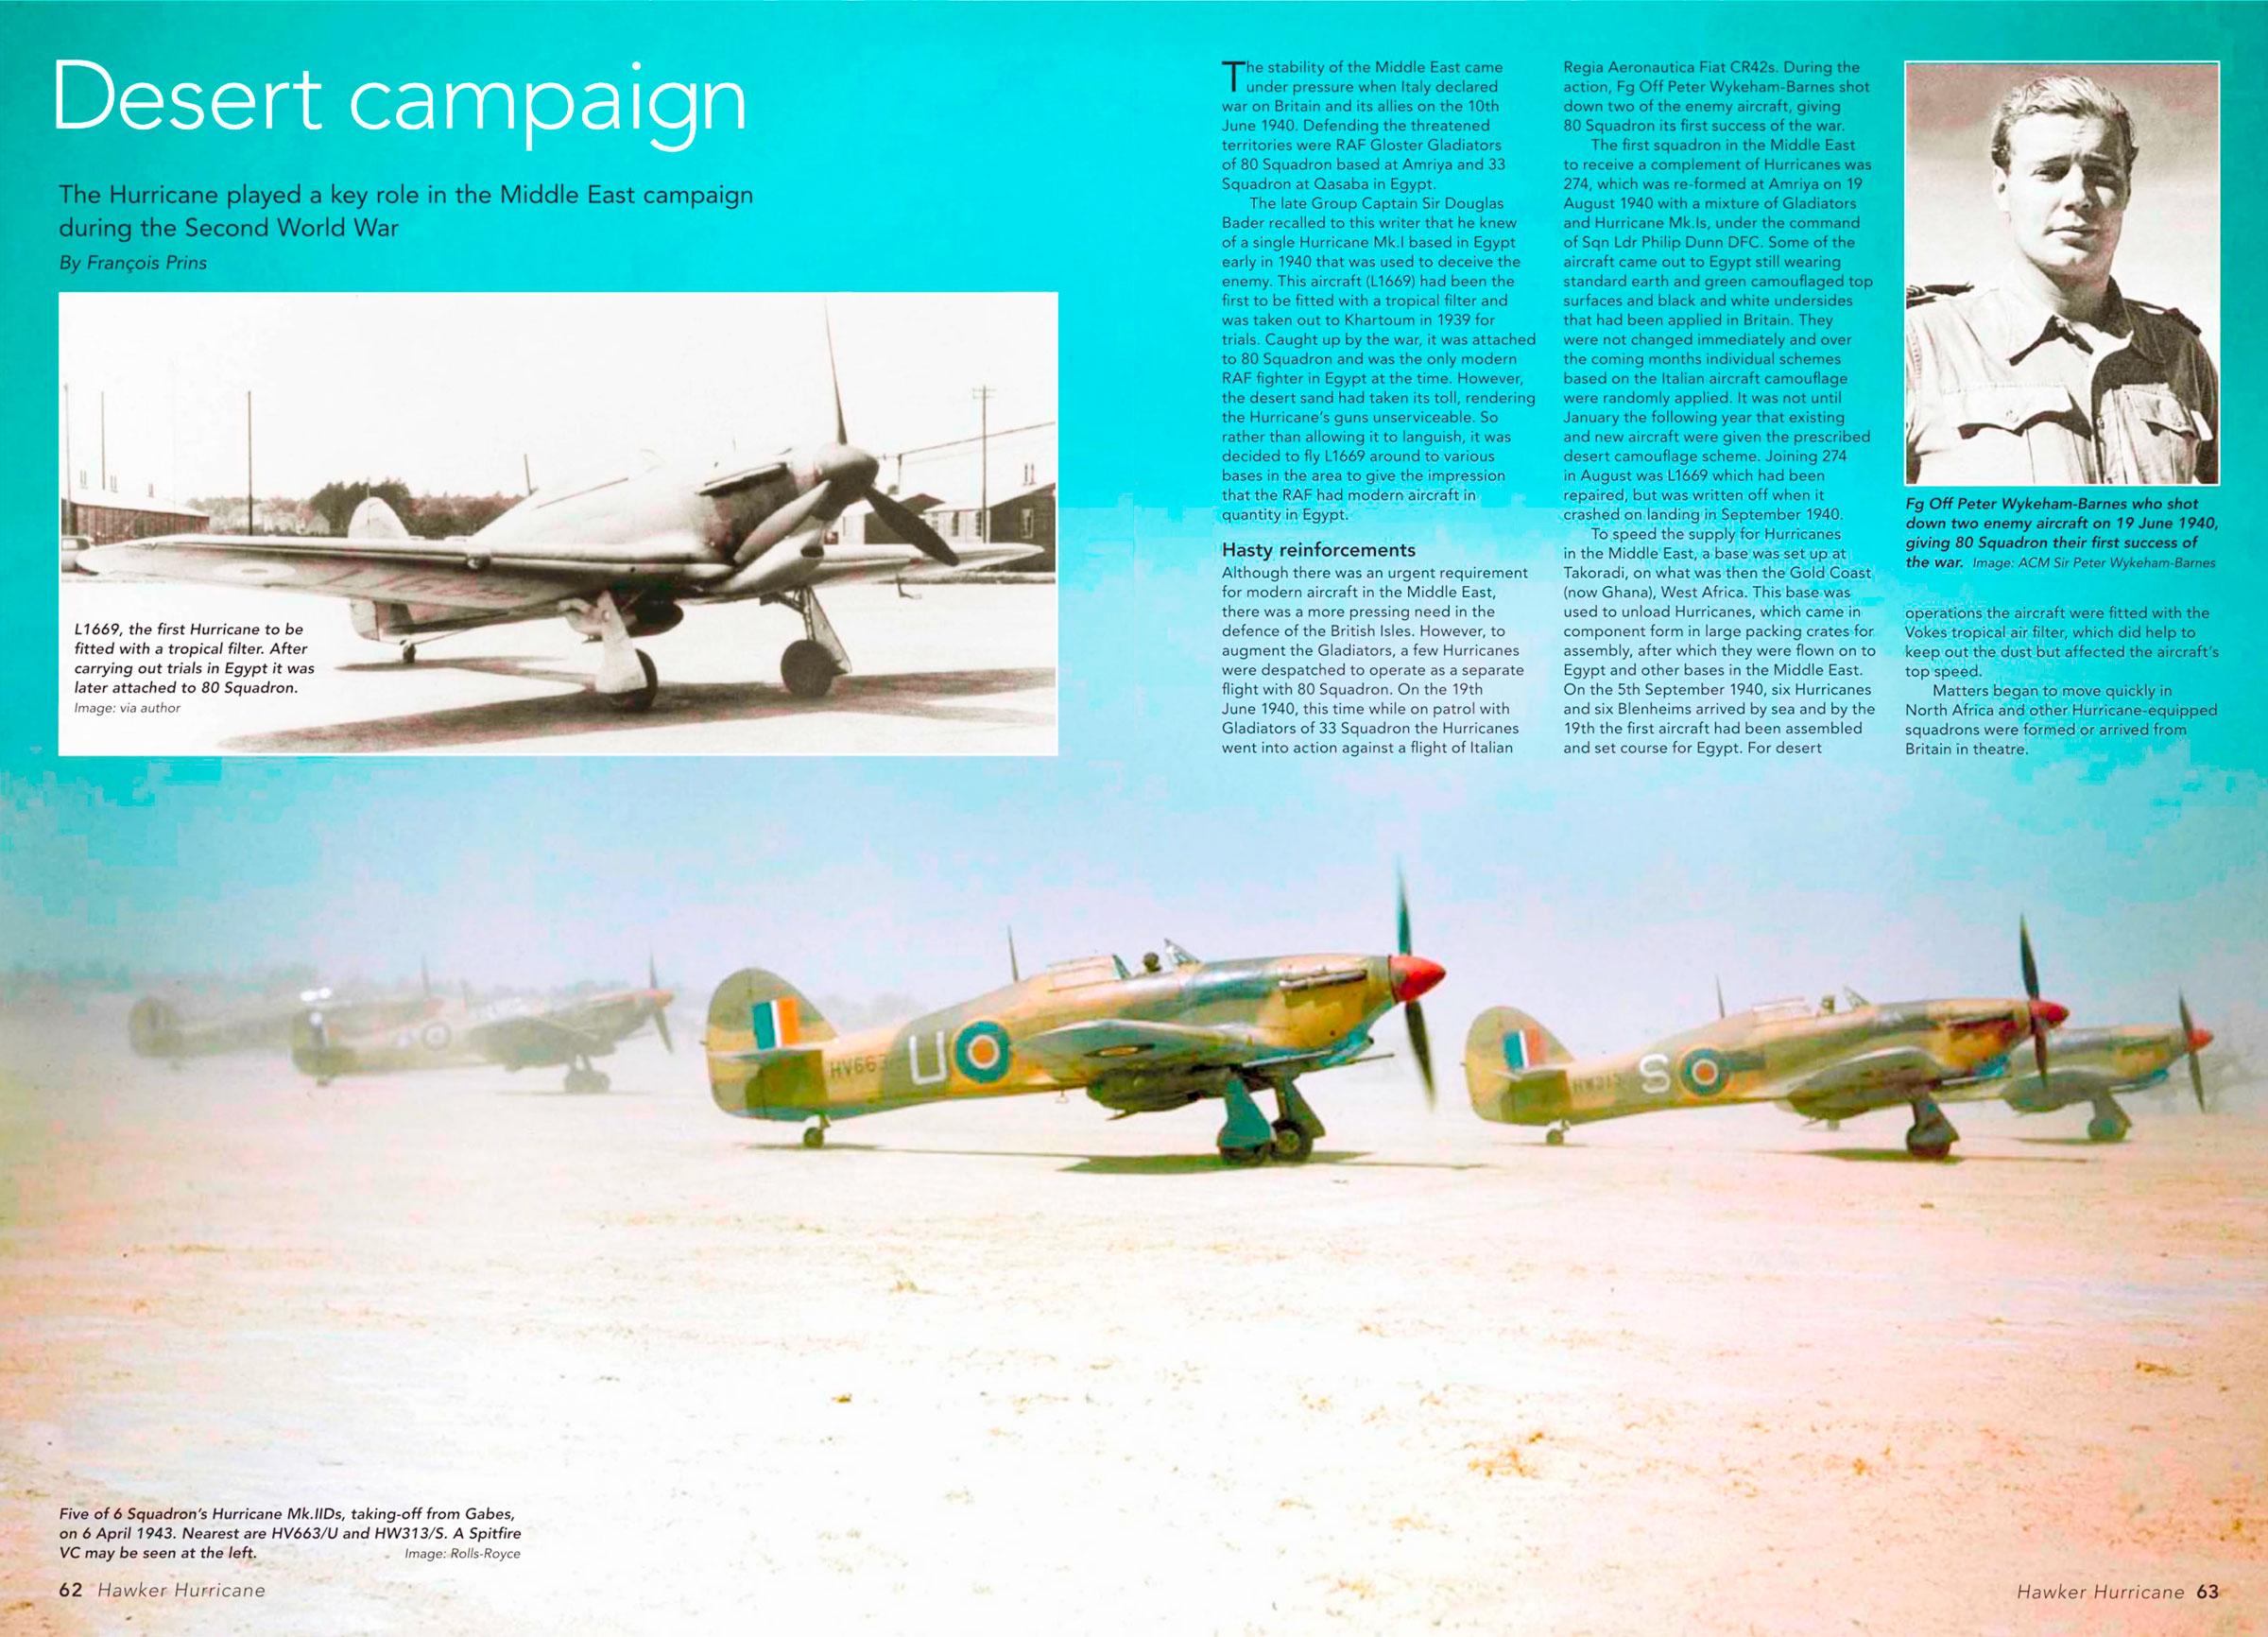 Hurricane IId RAF 6Sqn S HW313 Peterson sd attacking tanks at Skhira Tunisia 6th April 1943 02